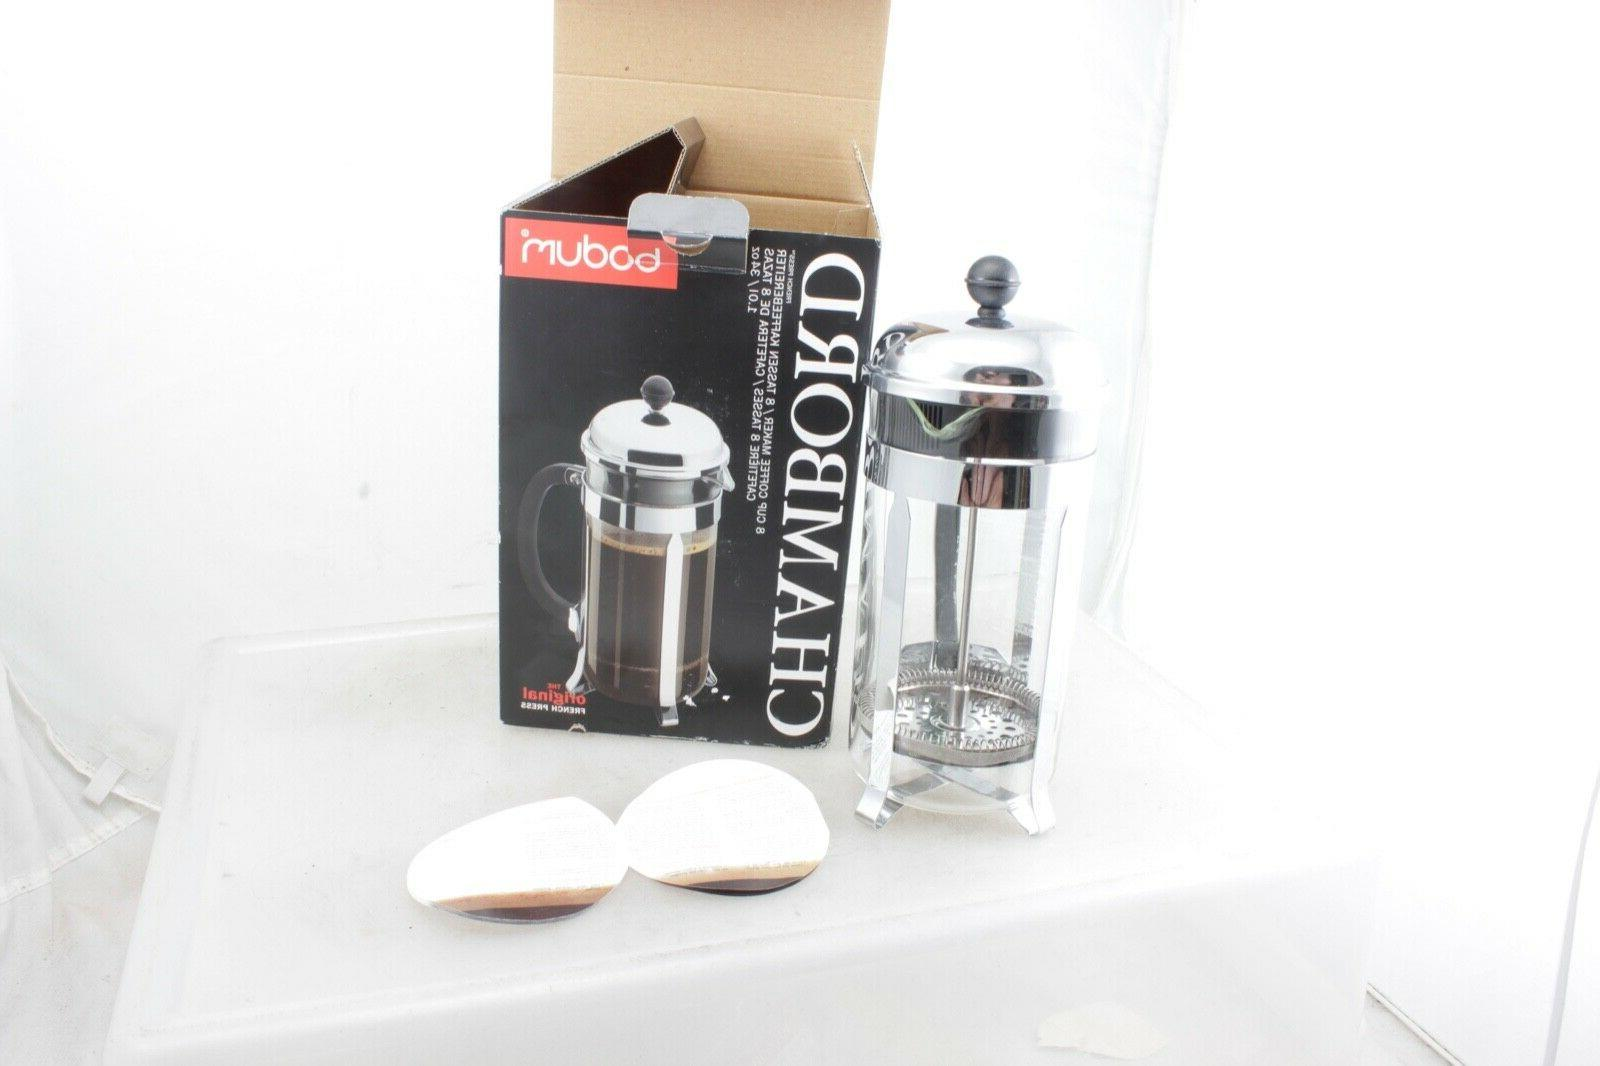 chambord chrome french press coffee maker 34oz